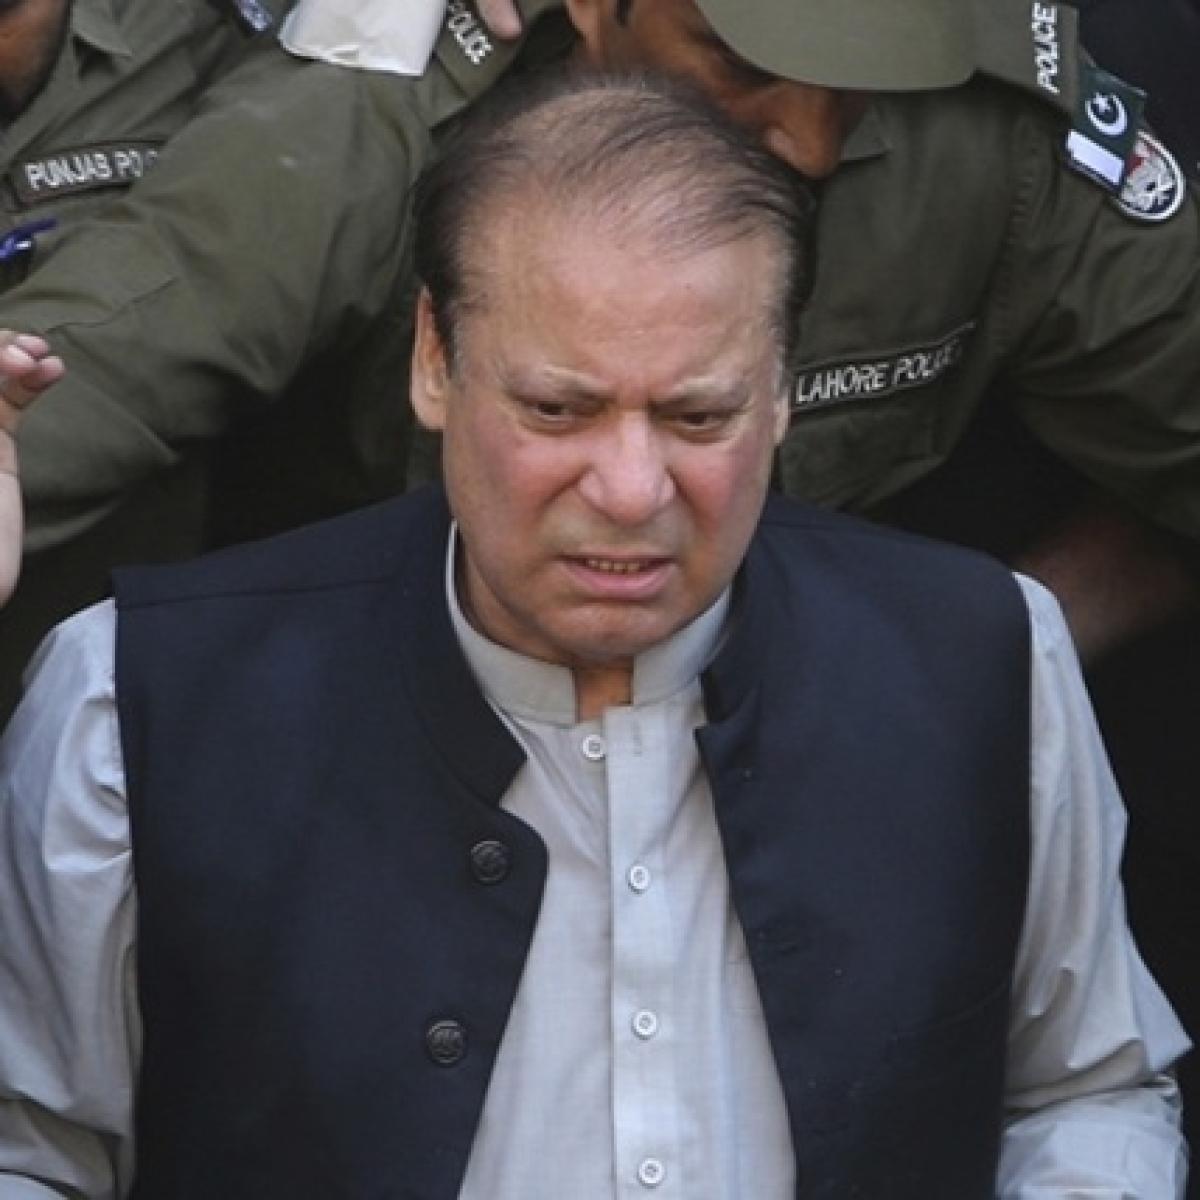 Nawaz Sharif's passport will be cancelled on Feb 16, says Pakistan minister